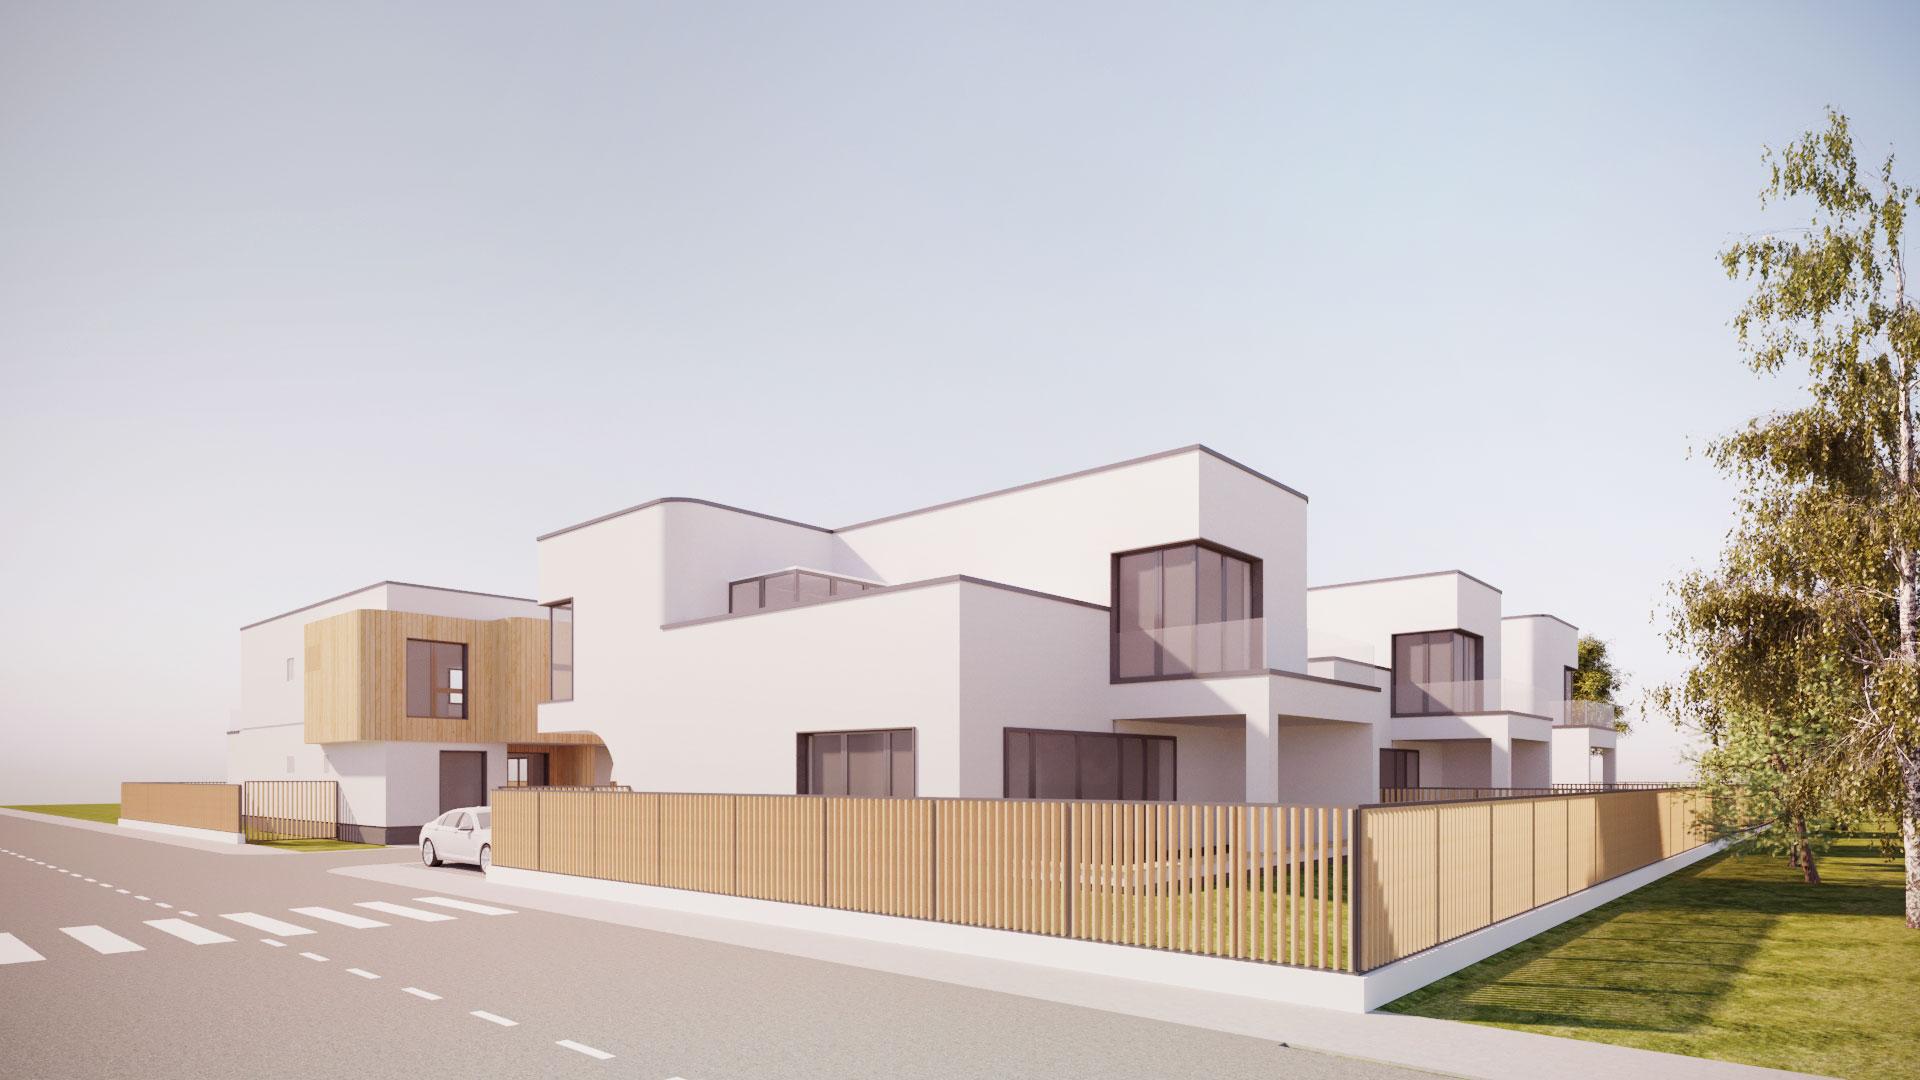 https://nbc-arhitect.ro/wp-content/uploads/2020/10/NBC-Arhitect-_-residential-_-Grand-Home-Residence-_-Romania_4.jpg